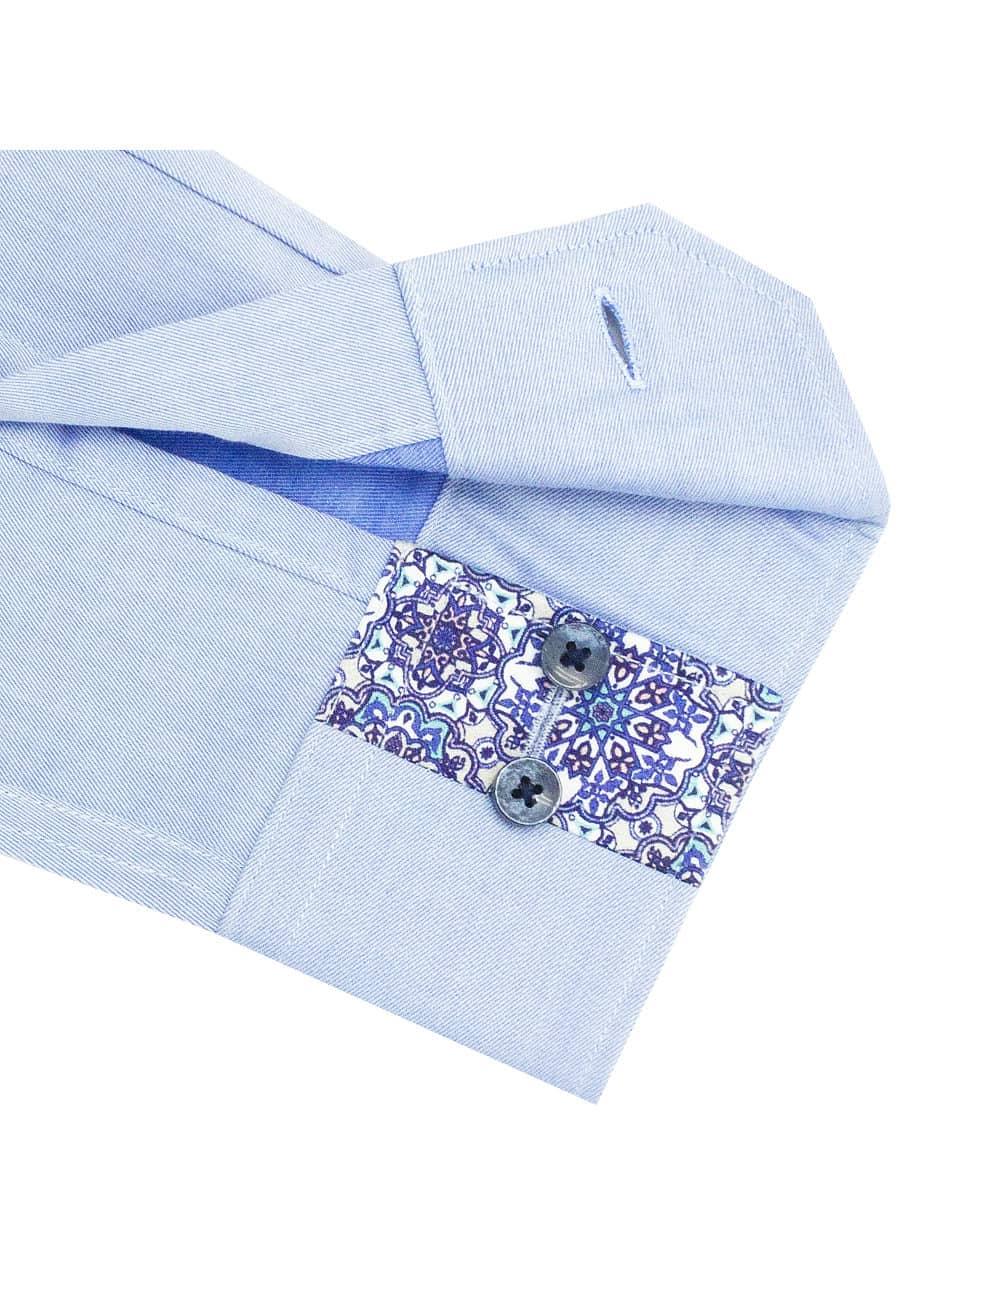 TF Solid Blue Twill 100% Premium Cotton Long Sleeve Single Cuff Shirt TF2F6.16